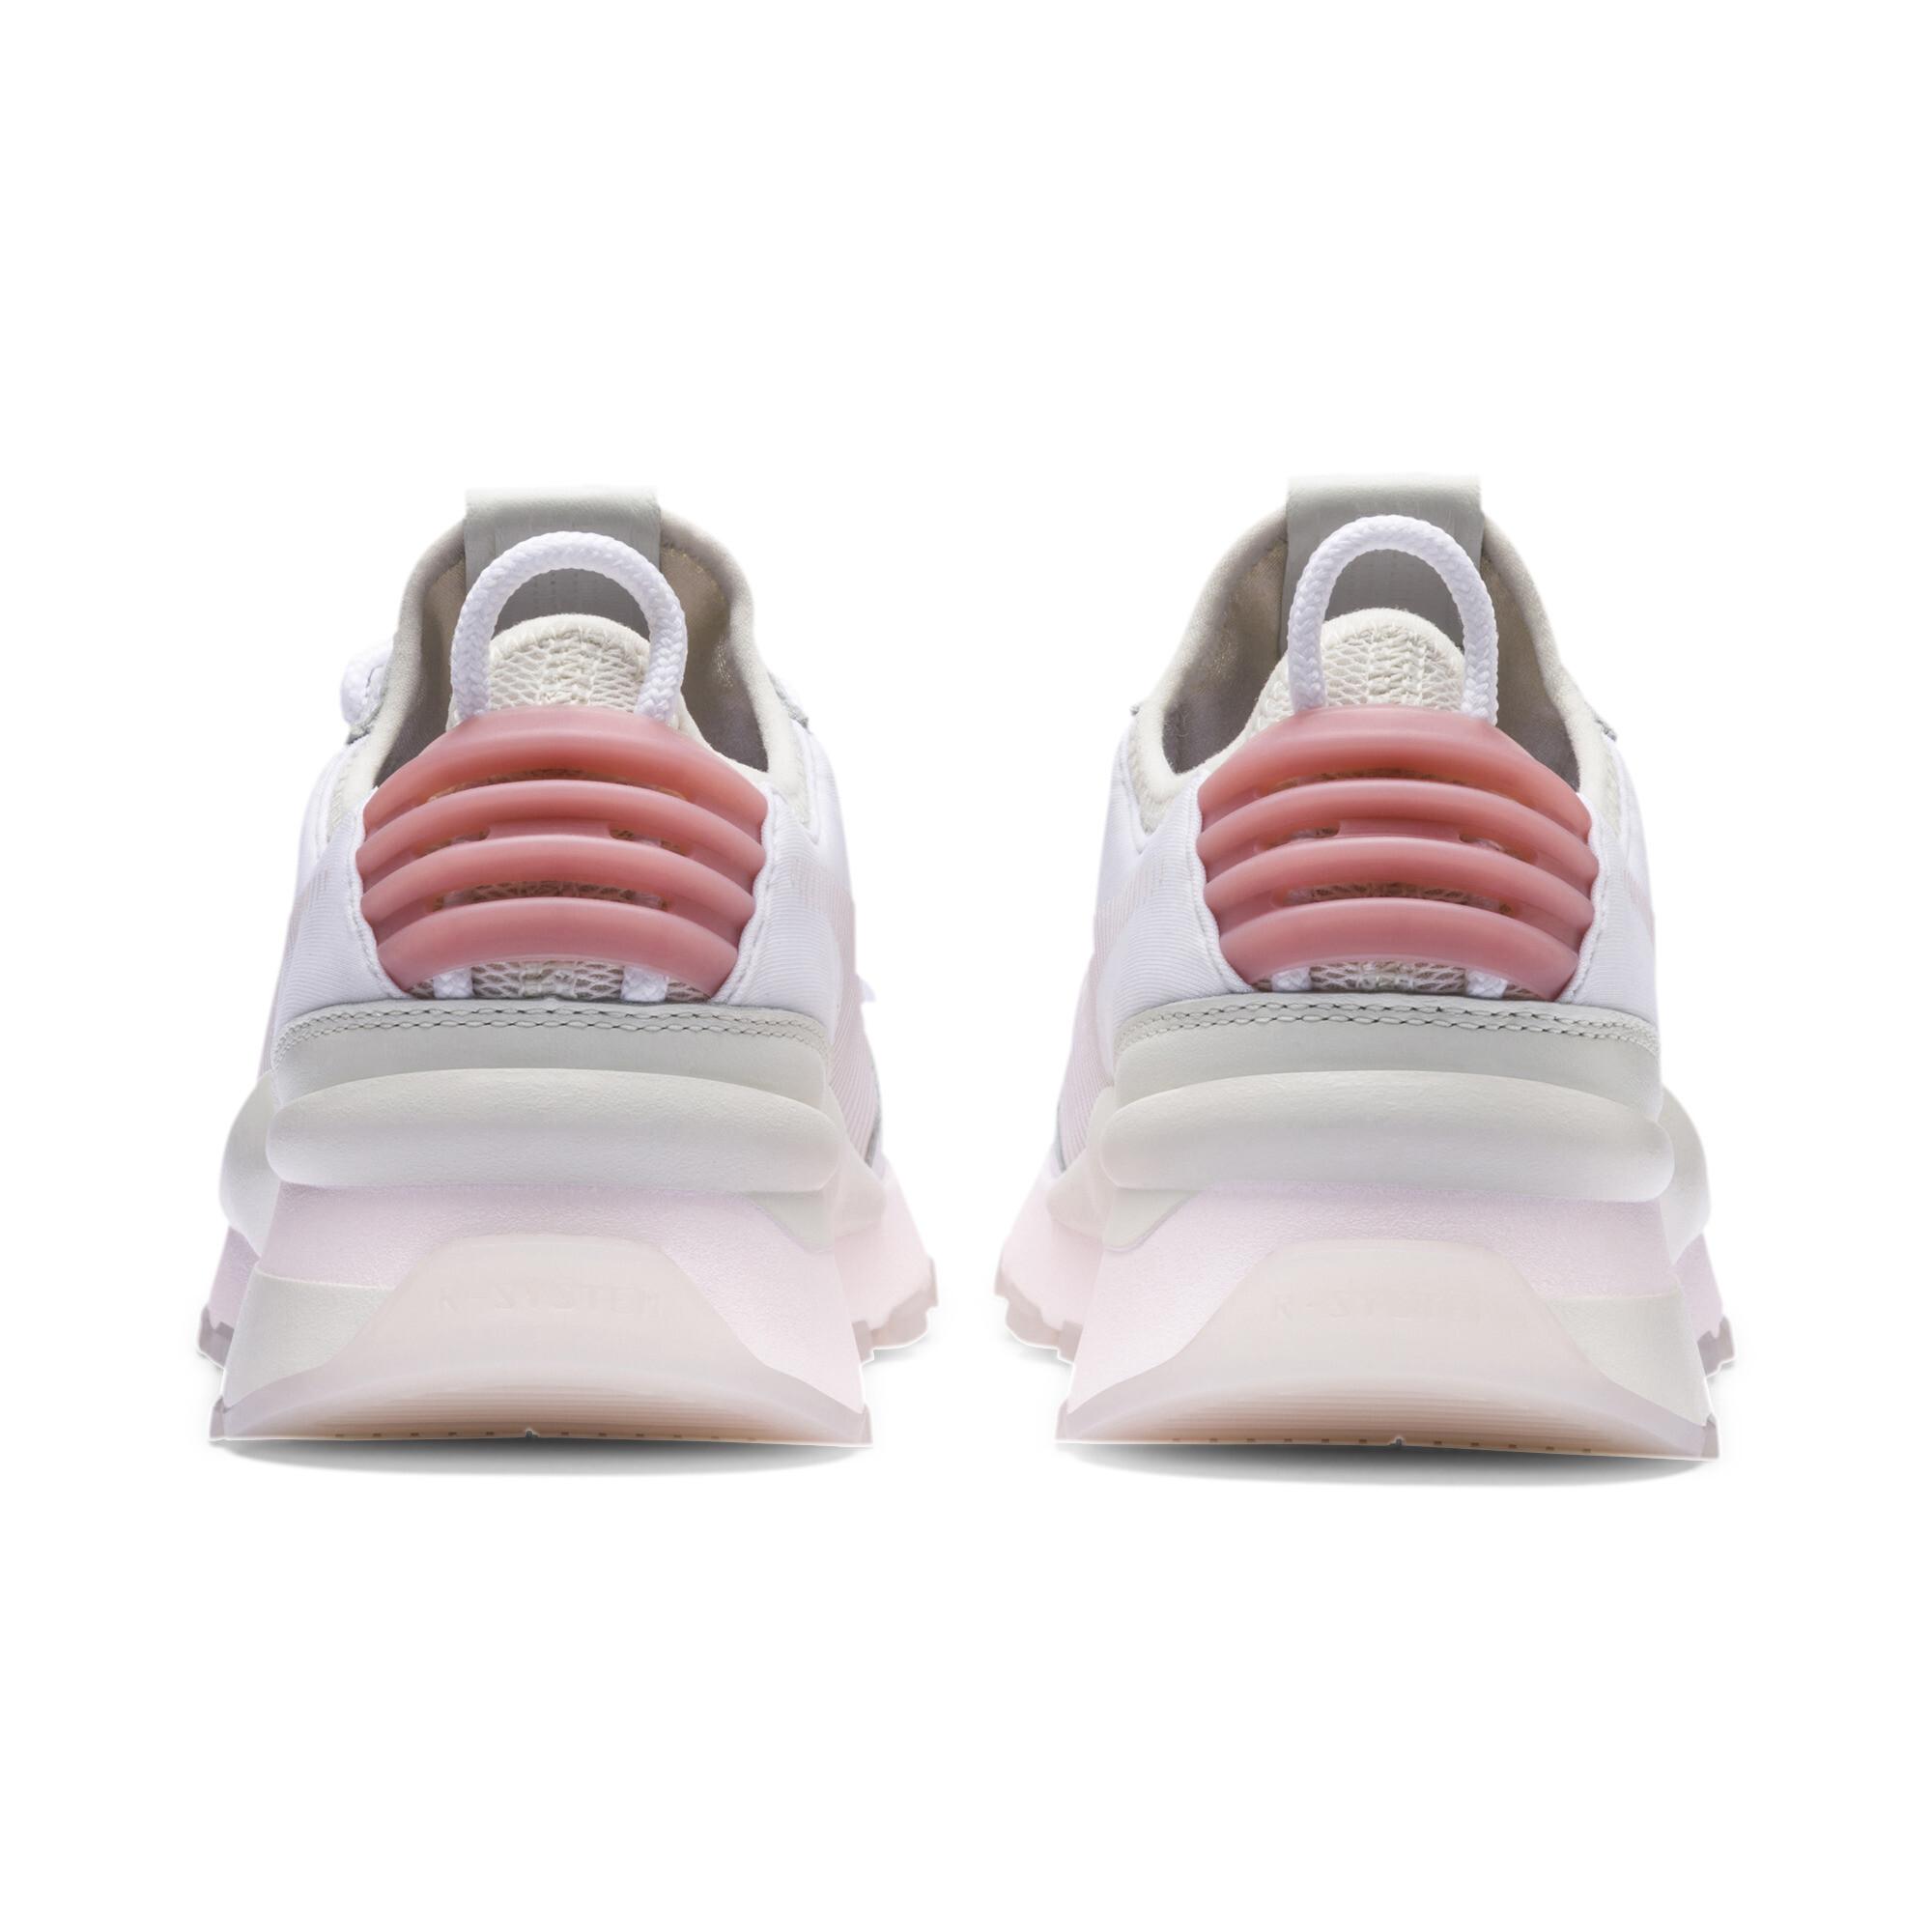 PUMA-RS-0-Tracks-Unisex-Shoe-Evolution thumbnail 10